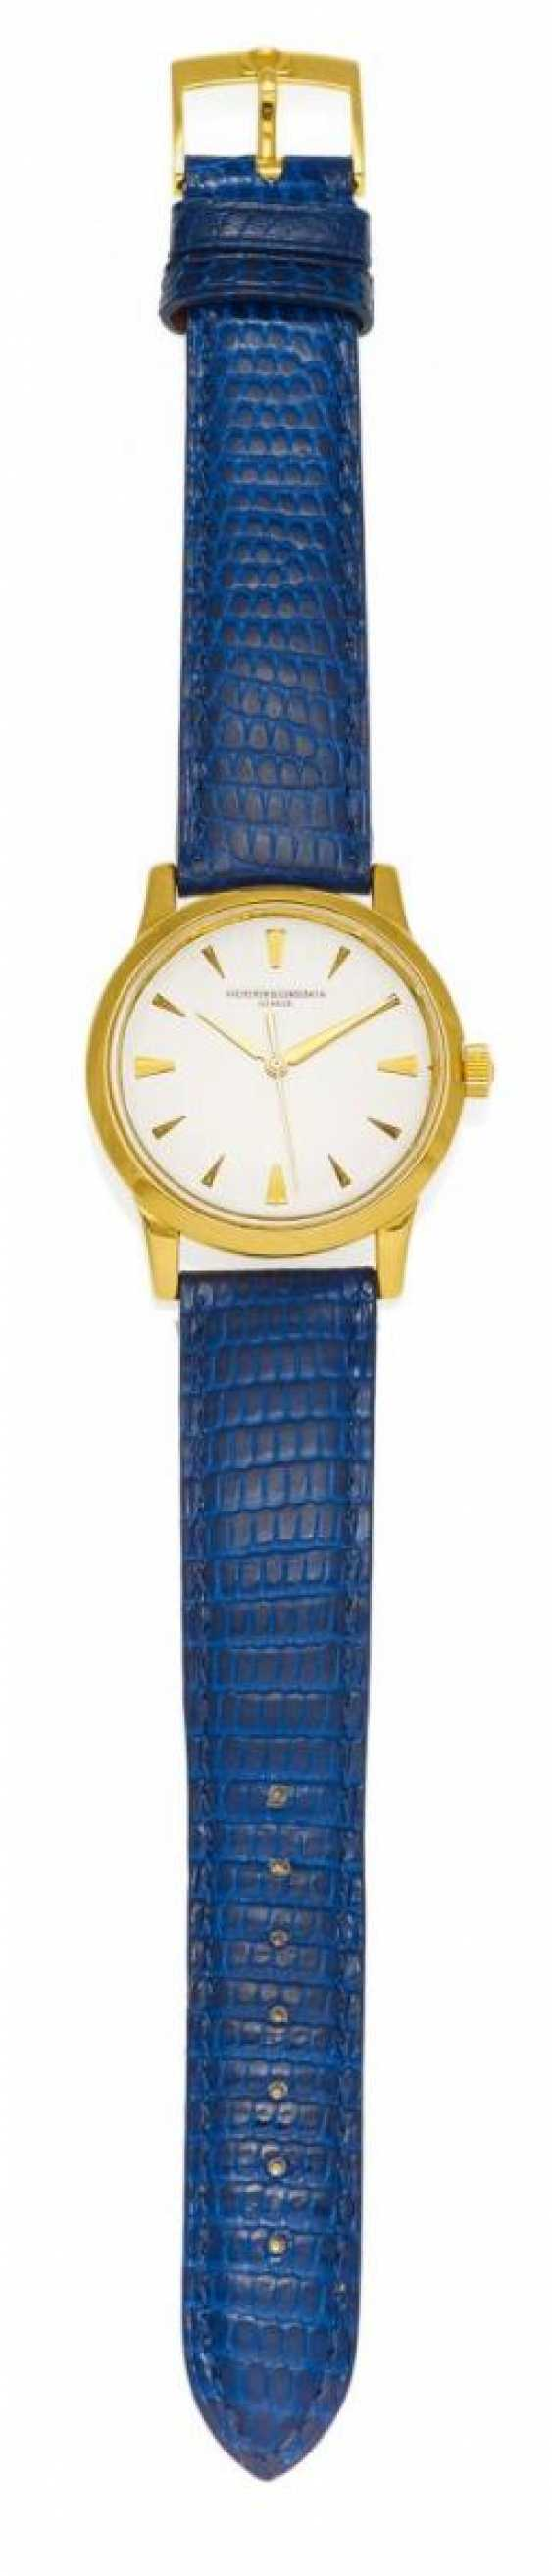 Men's watch. Automatic. 750/- yellow gold - photo 2